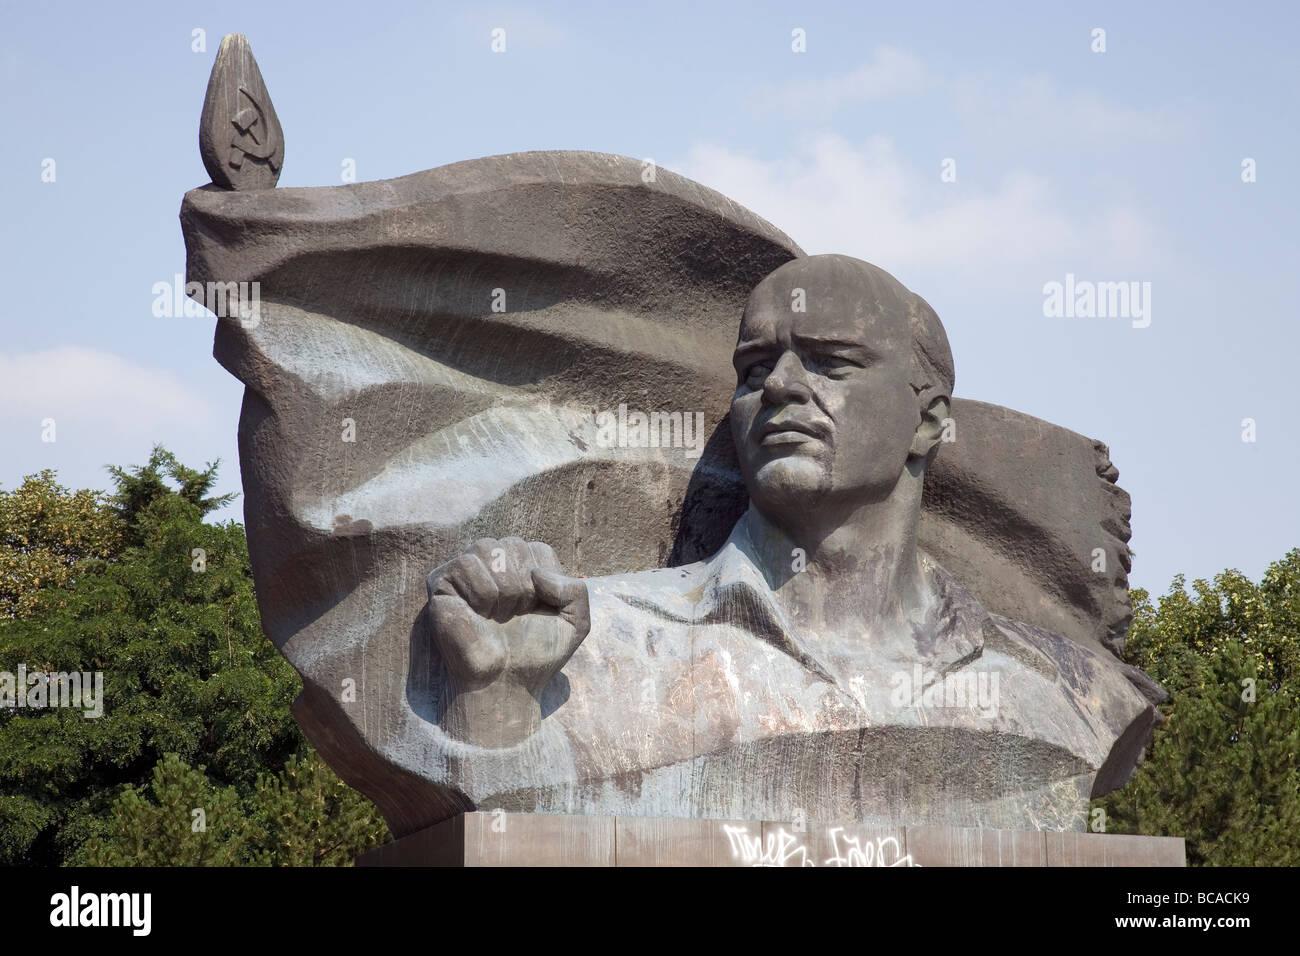 Ernst Thälmann Monument, Berlin, Germany - Stock Image